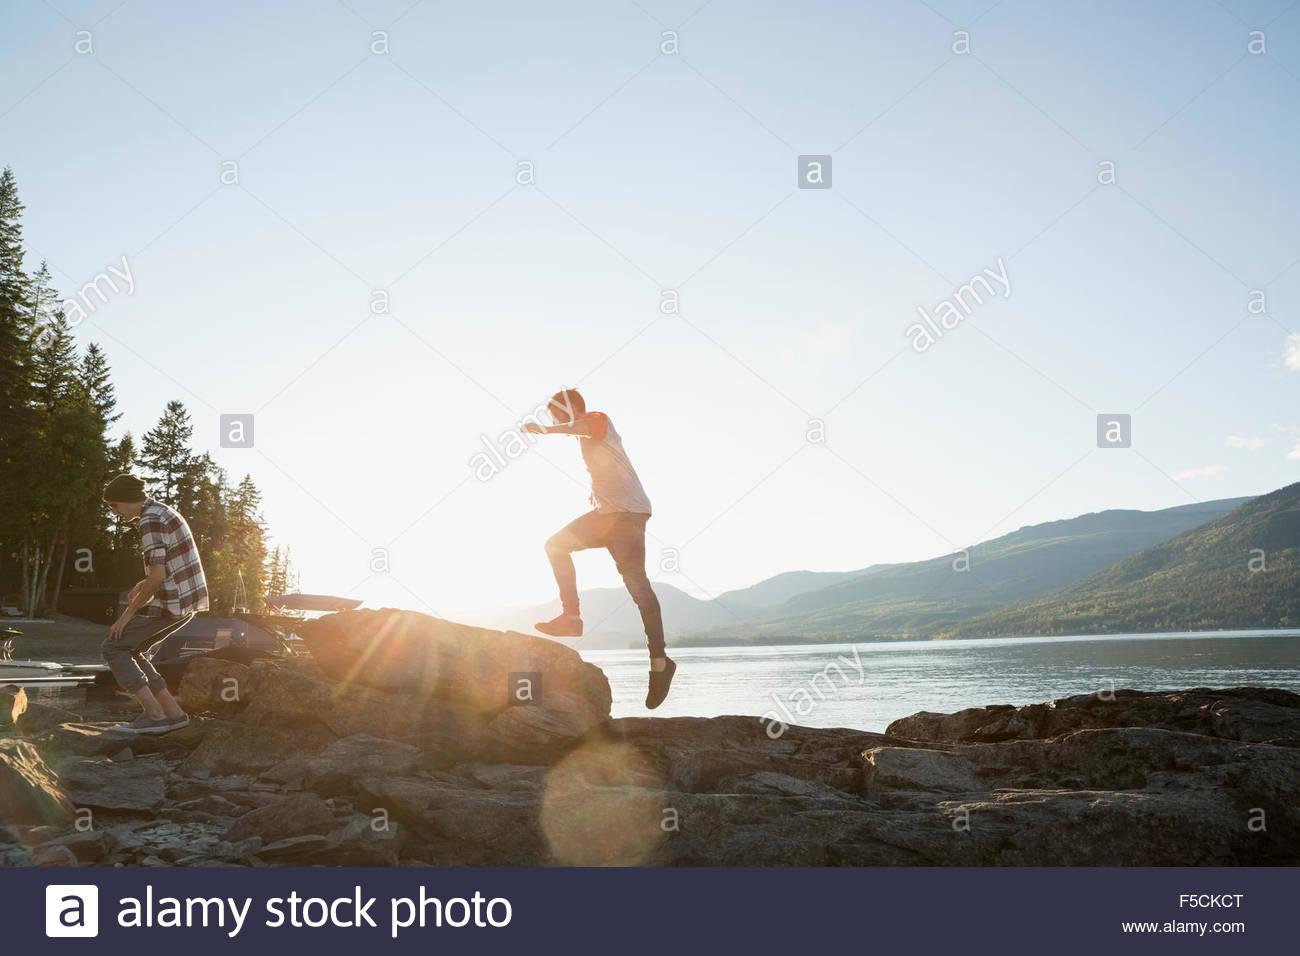 Junge Männer springen über Felsen am sonnigen Seeufer Stockbild